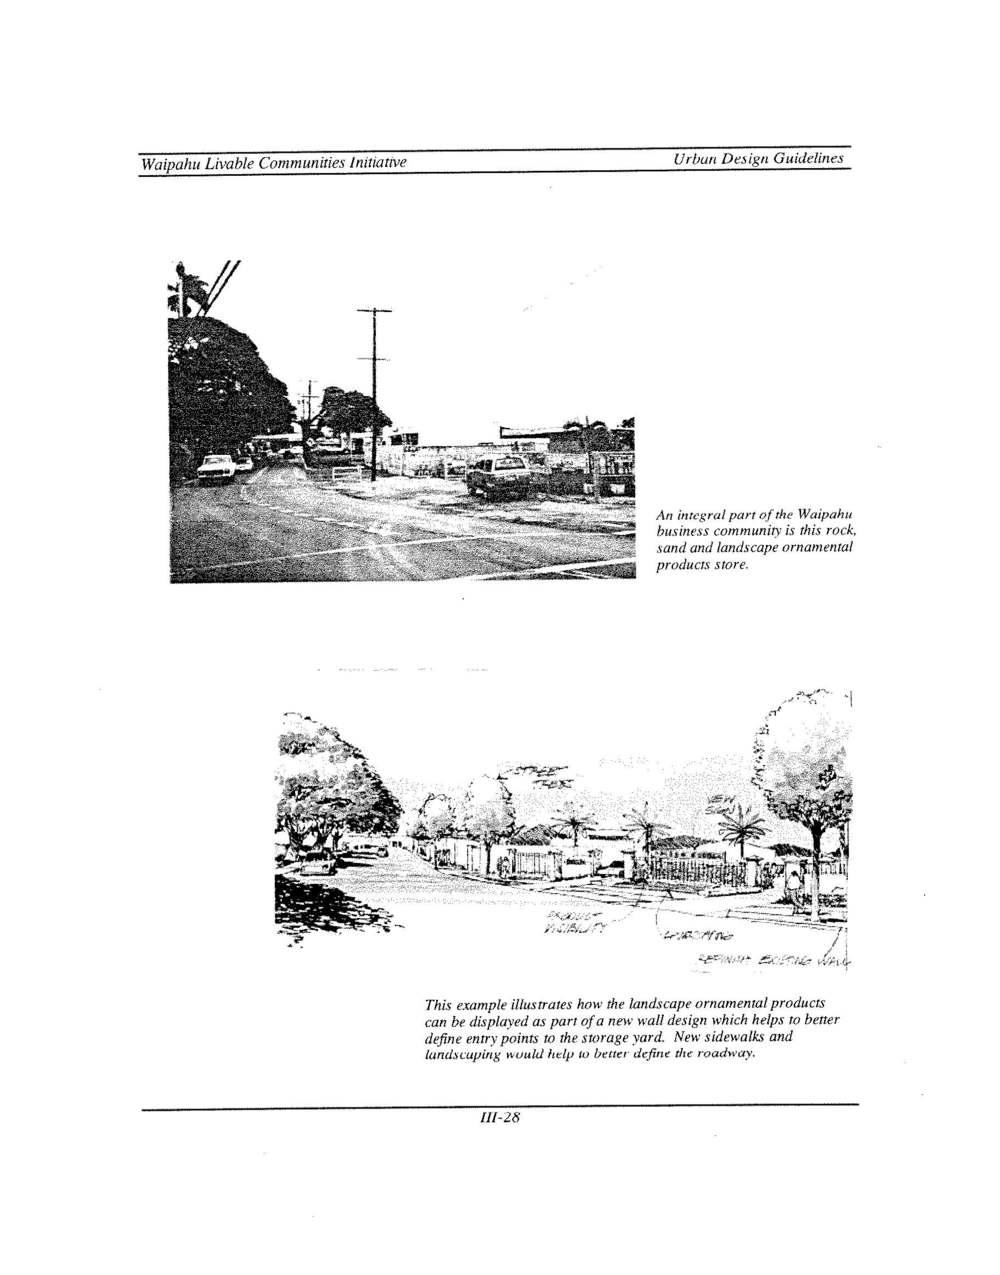 160531_WaipahuLivableCommunities(1998)_Page_118.jpg